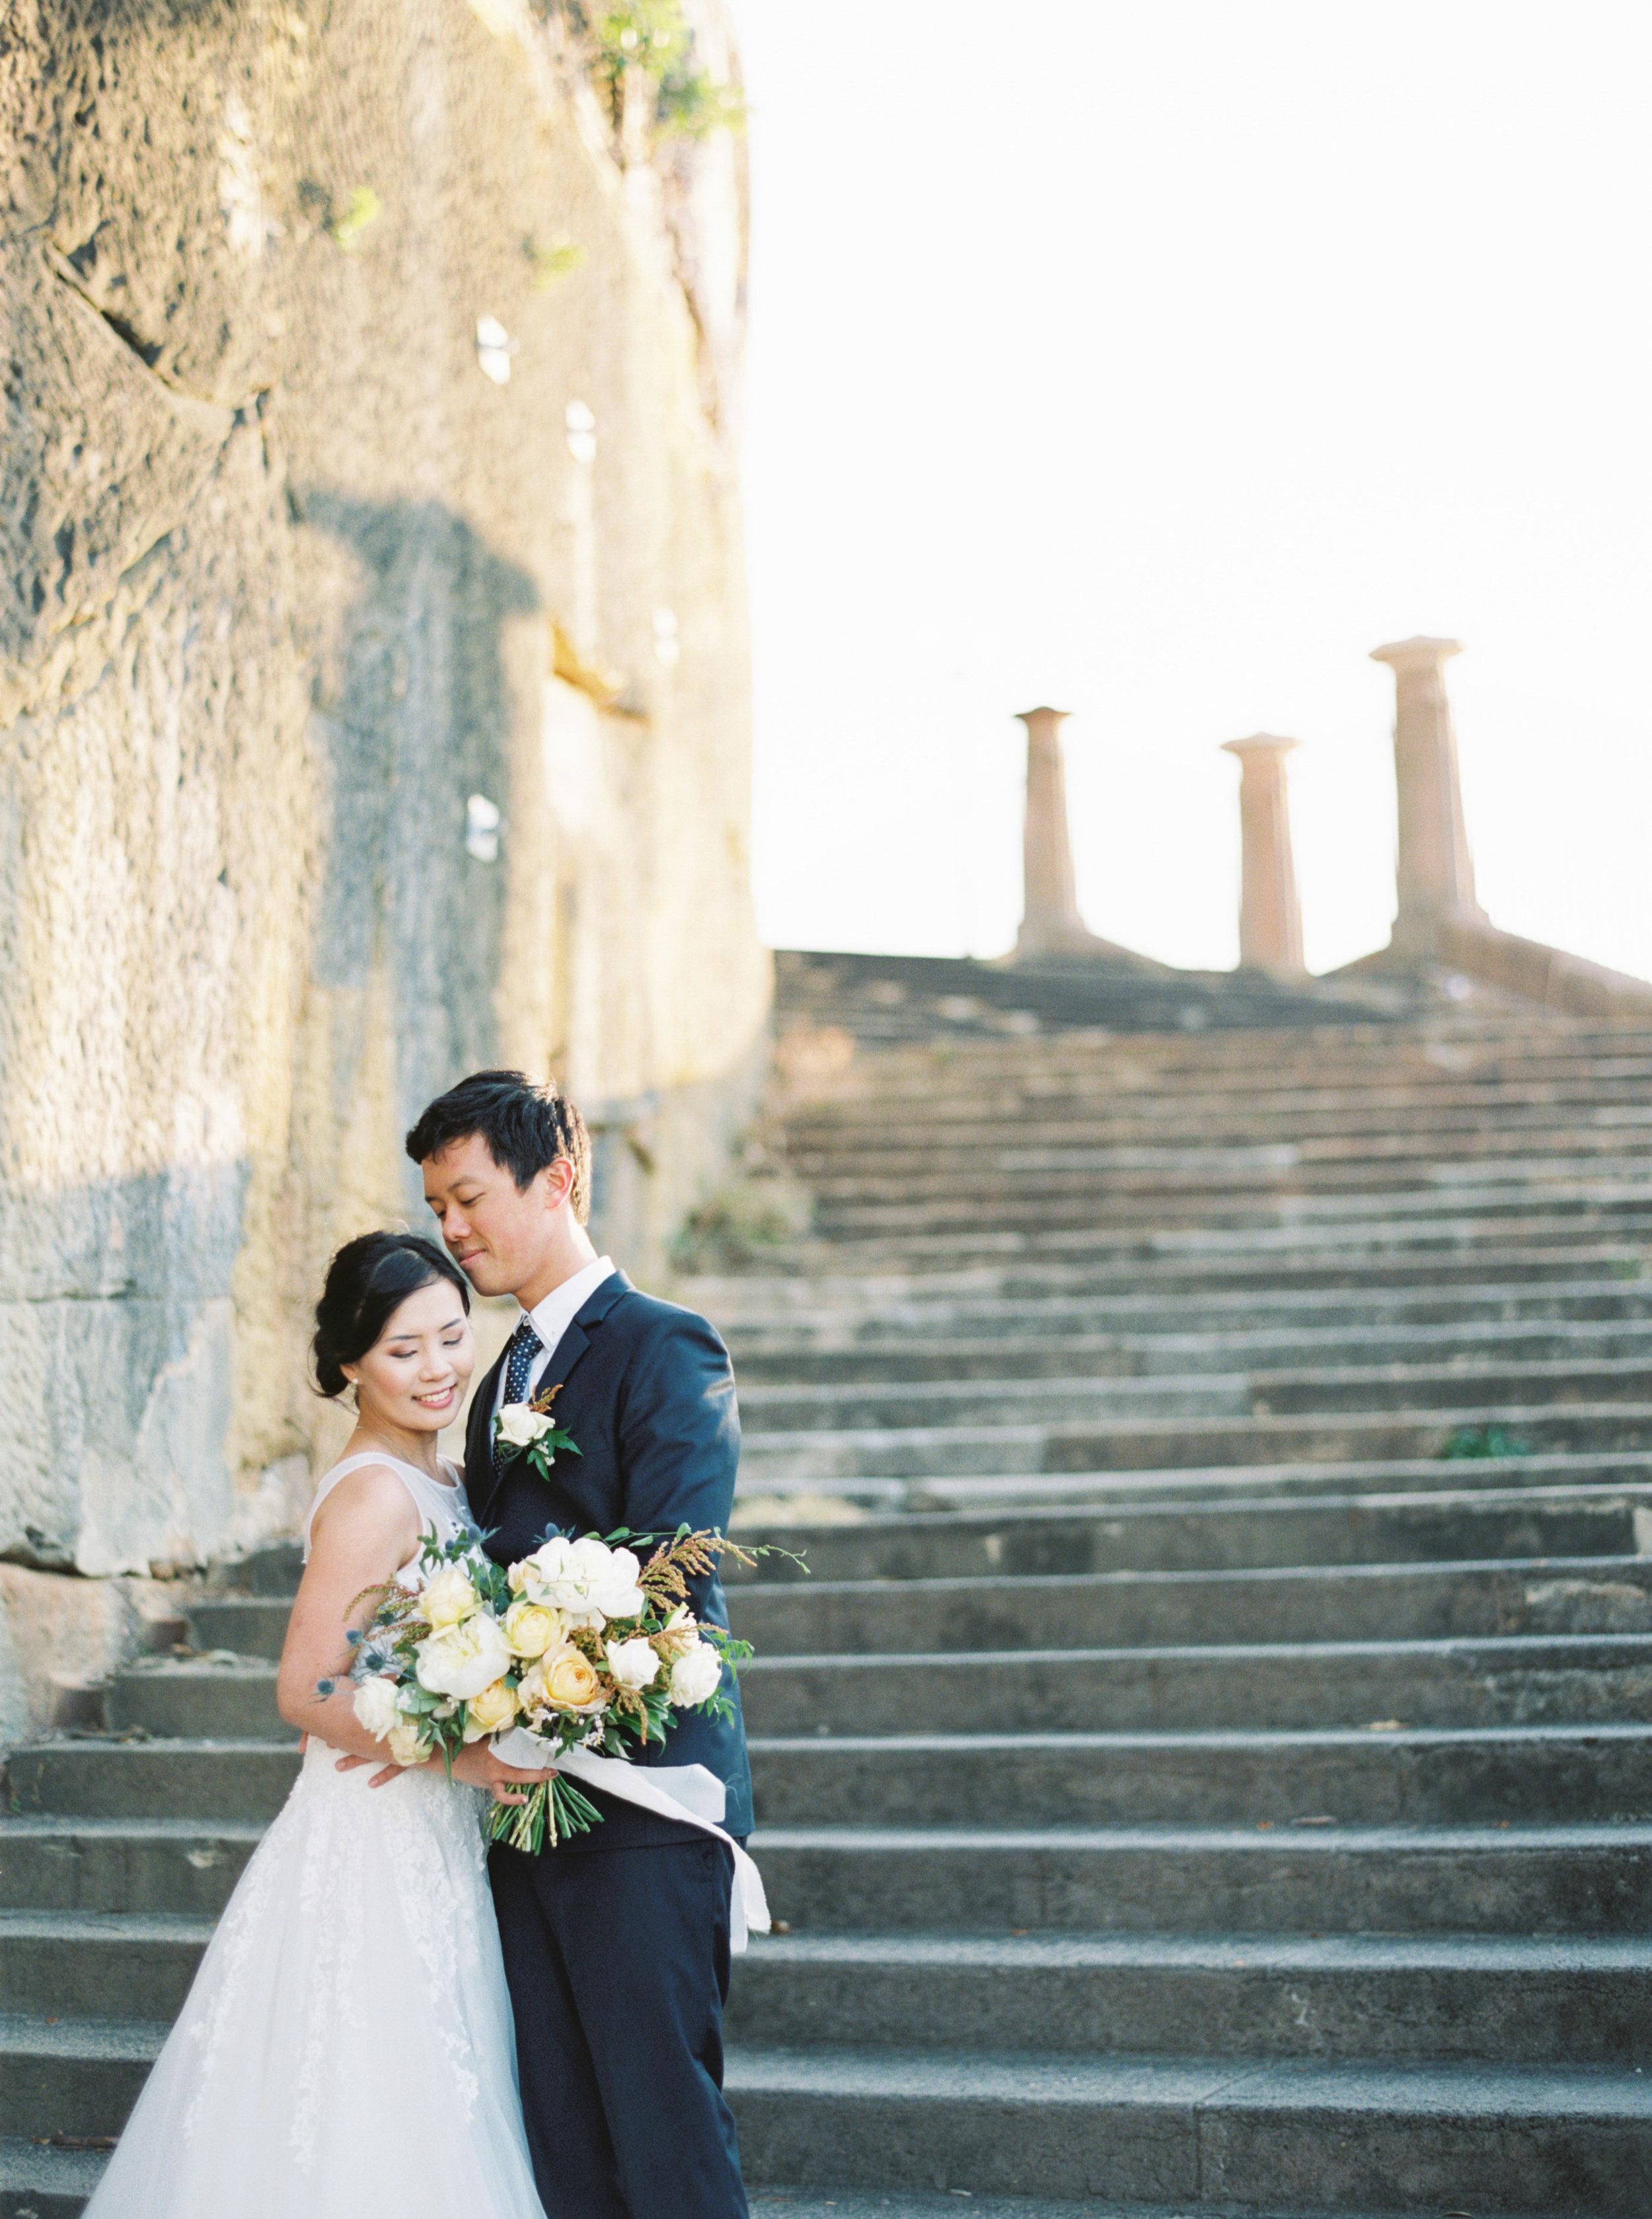 00004- Australia Sydney Wedding Photographer Sheri McMahon.jpg